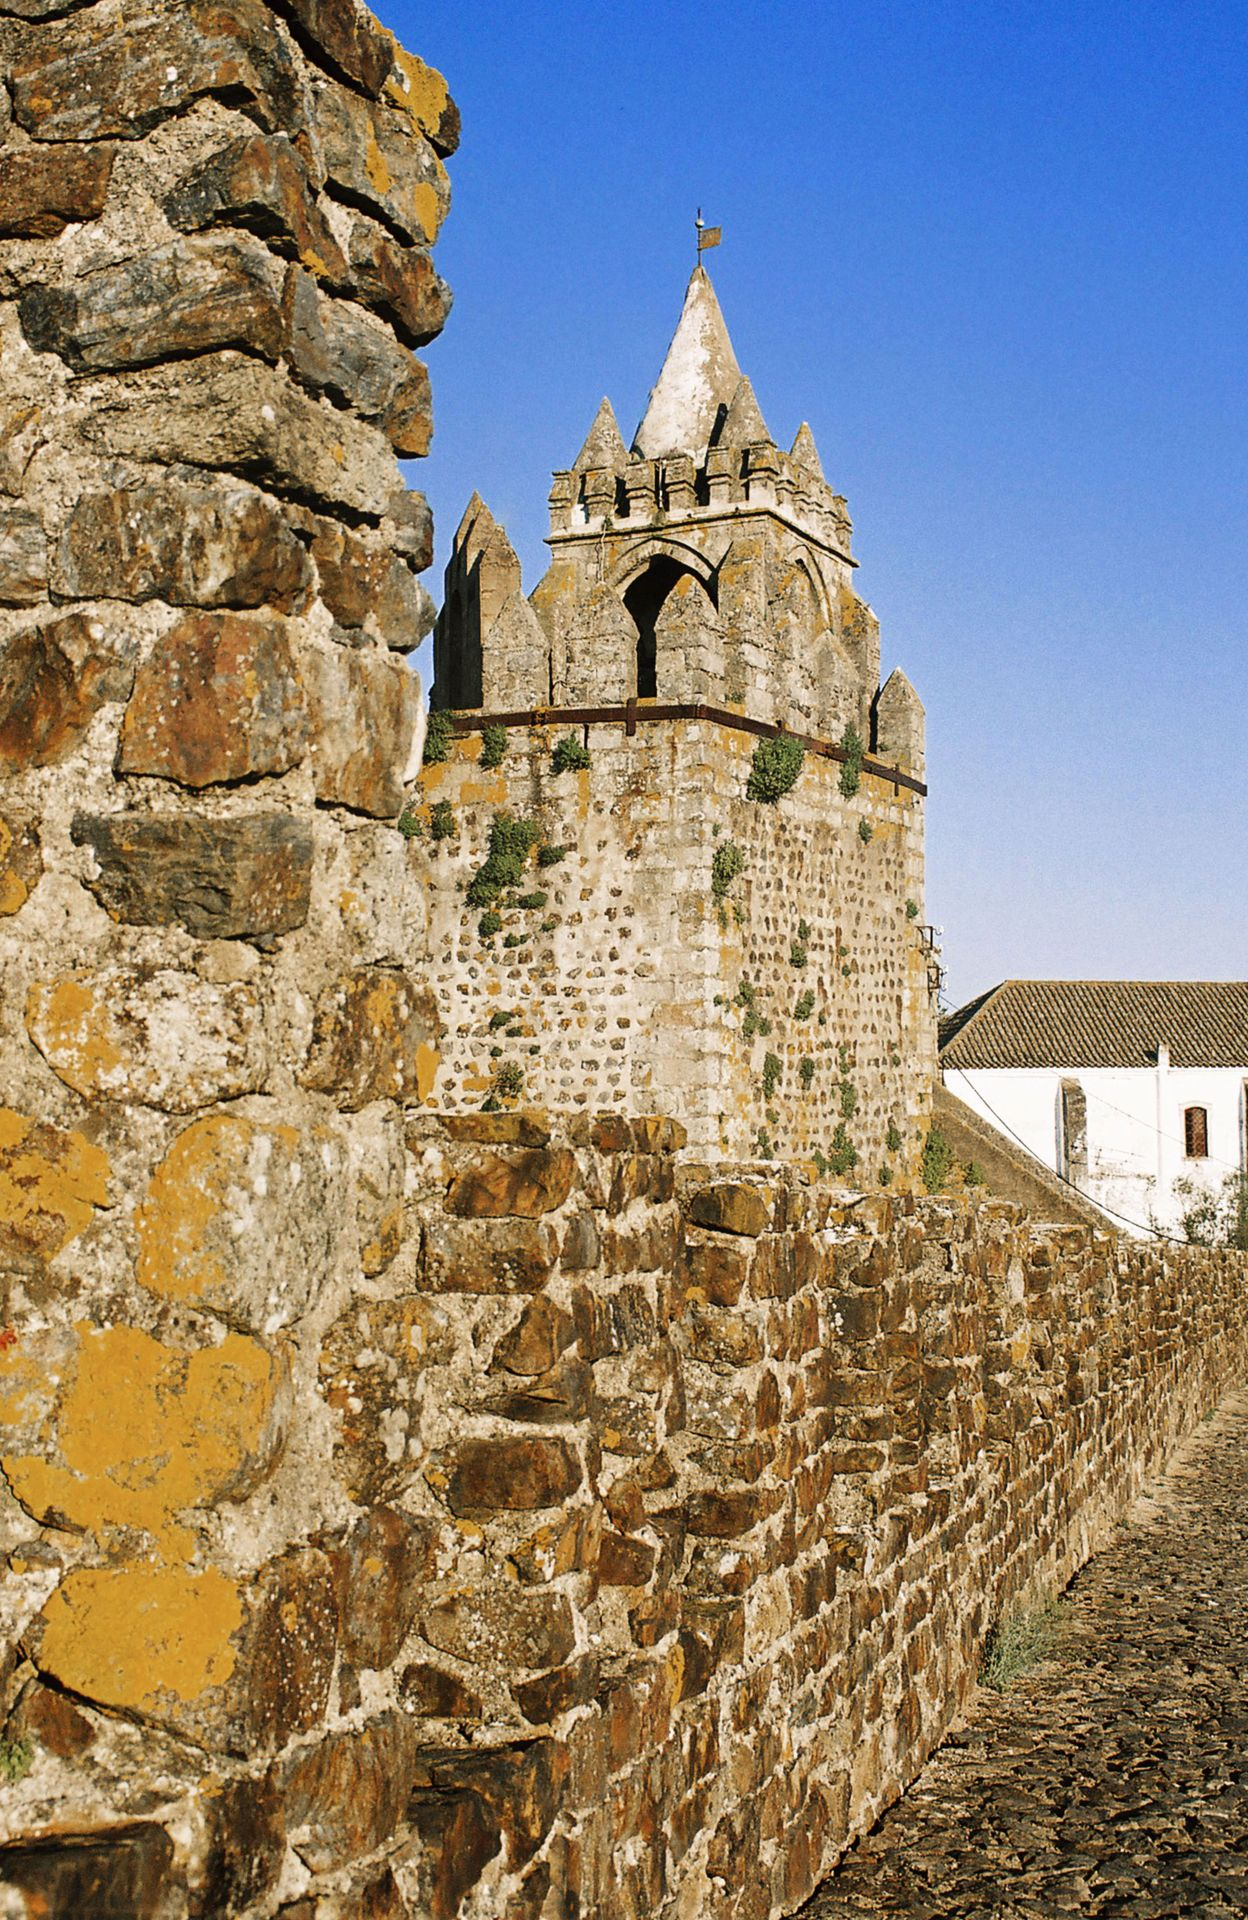 Castelo de Montemor-o-Novo (CMMN, 2003)